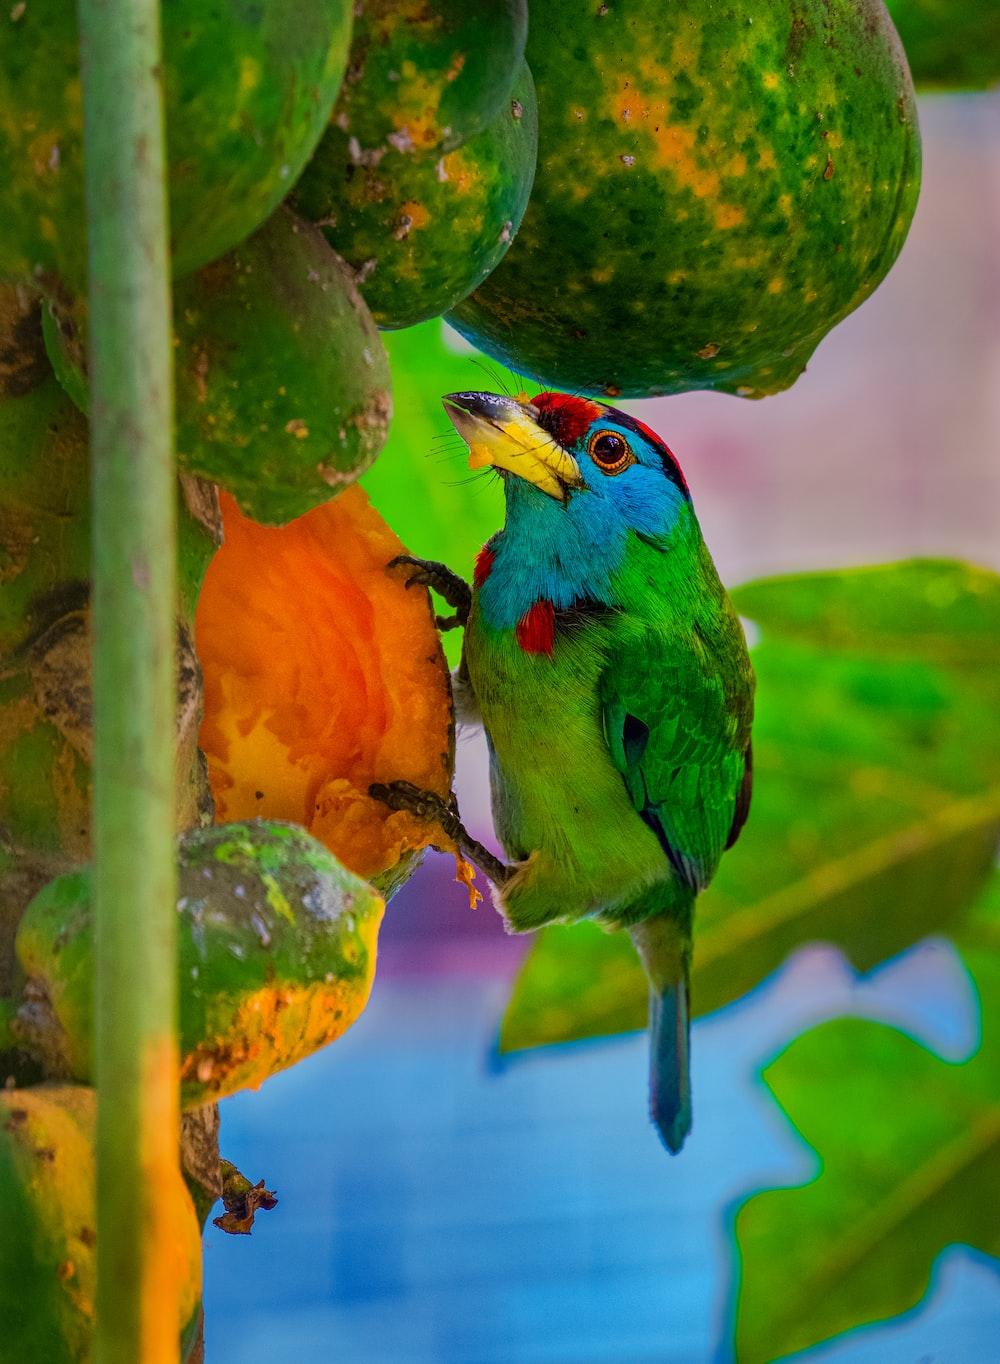 green and orange bird on green fruit